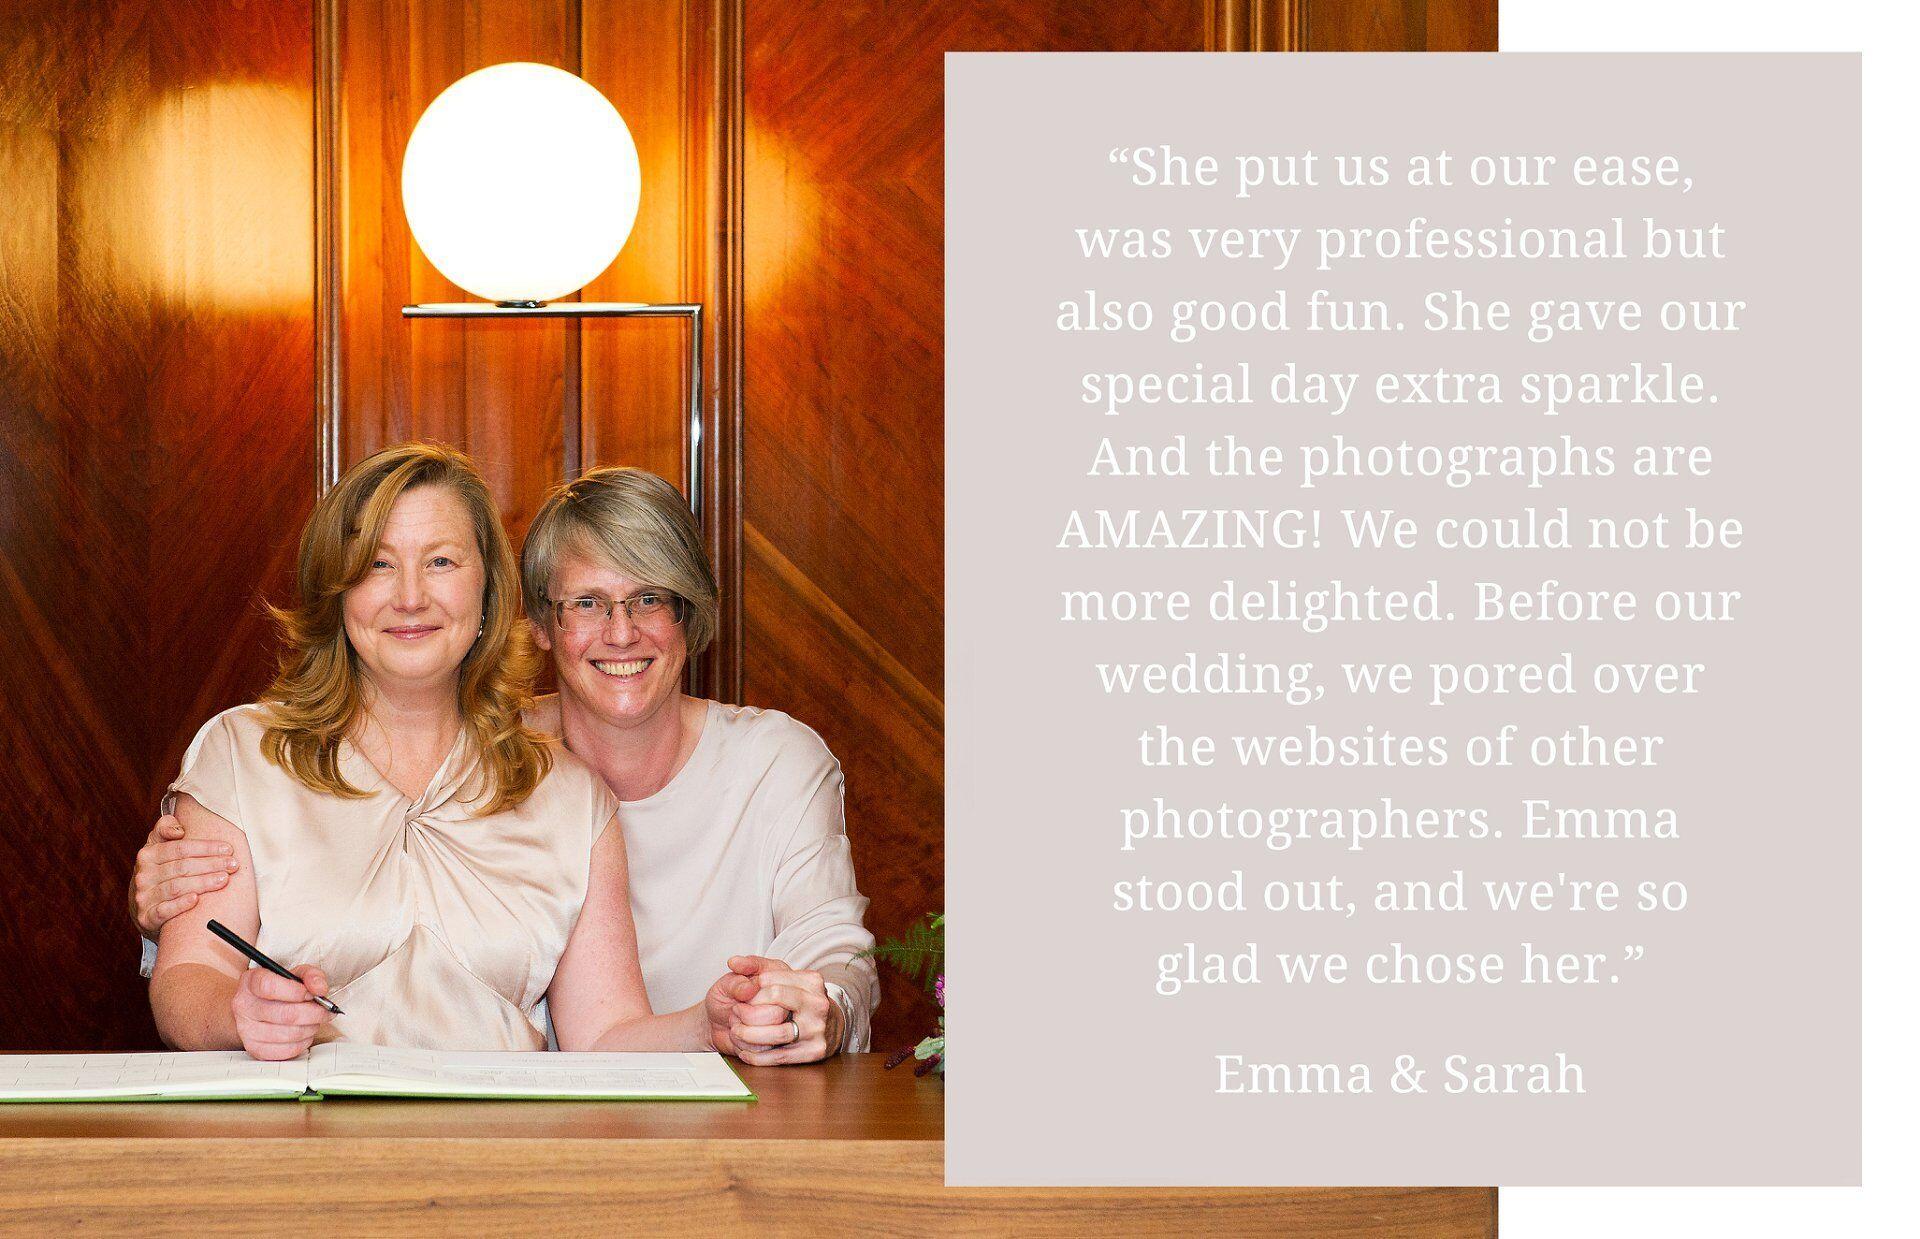 emma and sarah's client testimonial for emma duggan photography - paddington room wedding photography